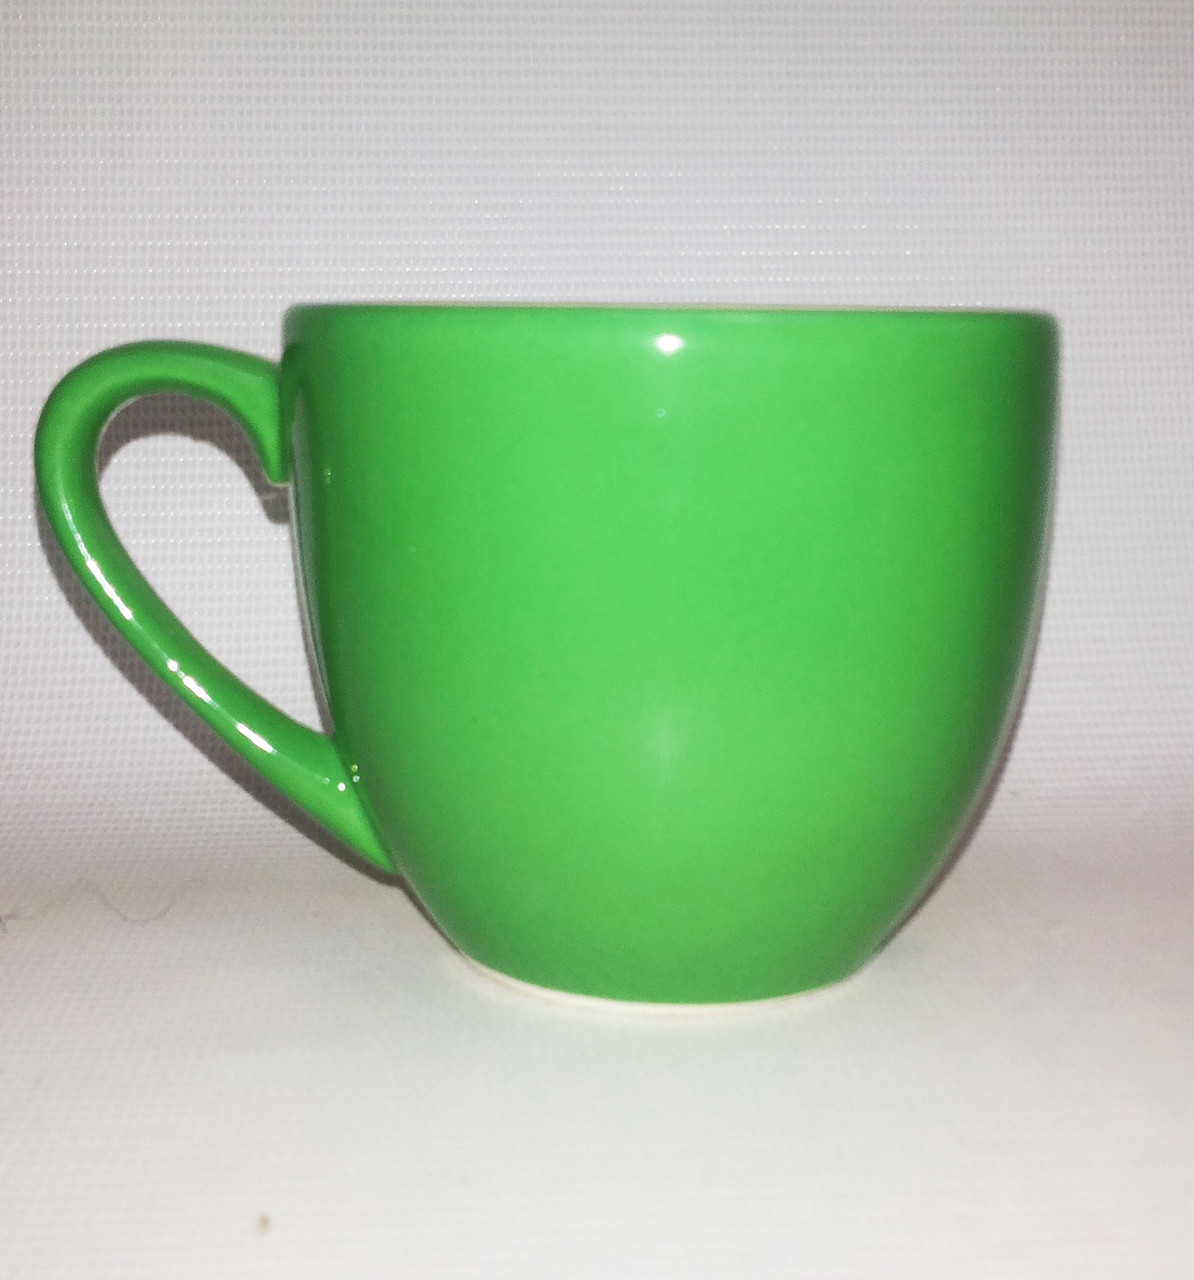 Кружка детская цветная глазурь - зеленаая 250 мл.